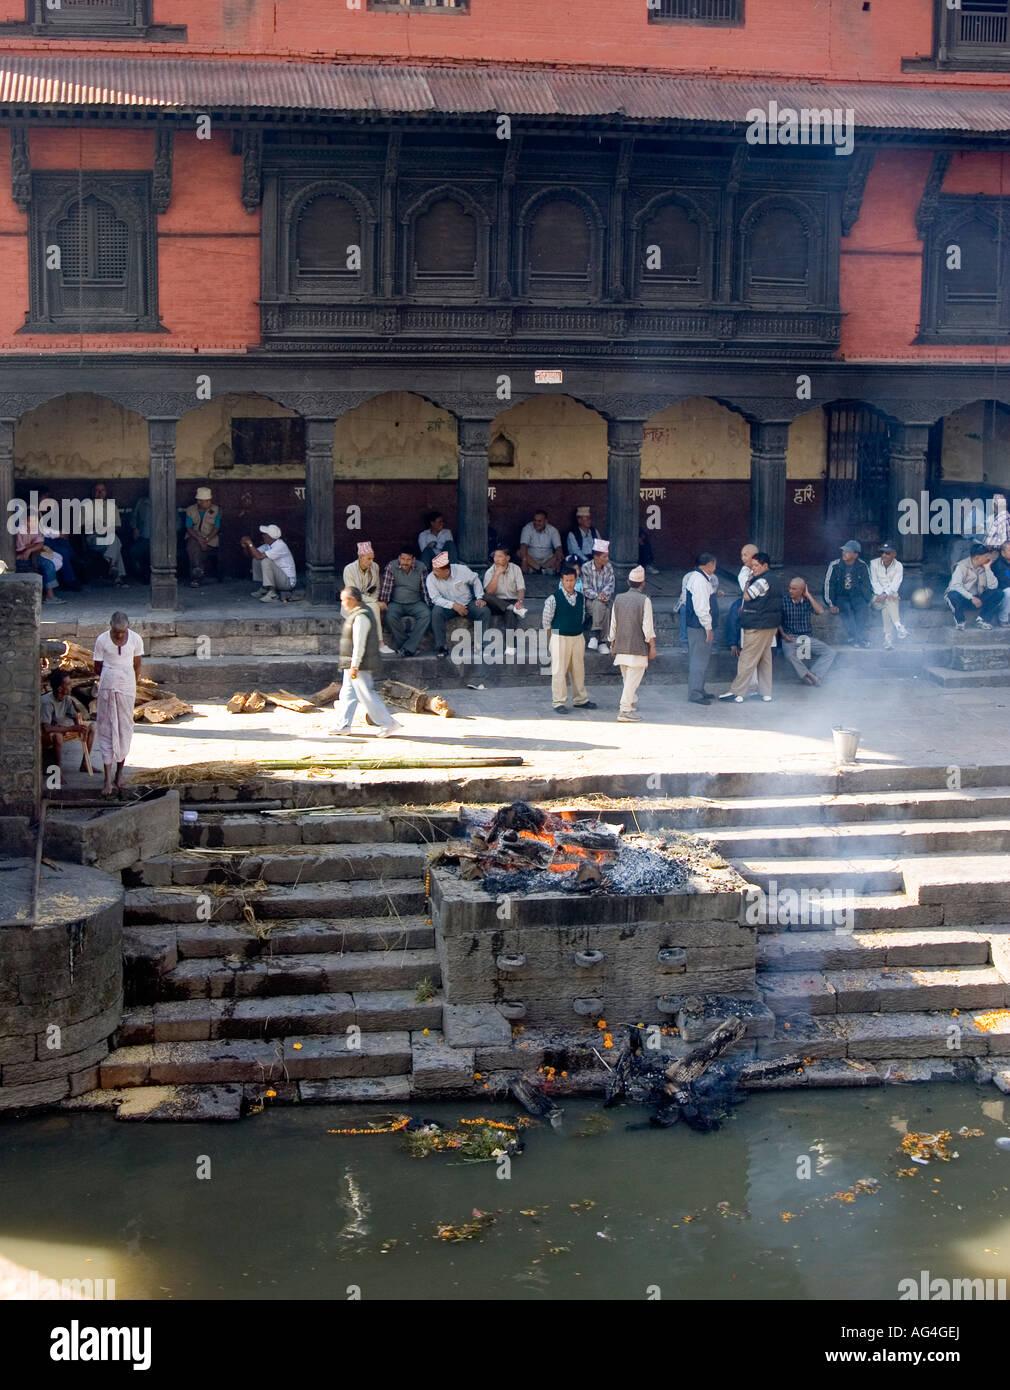 Cremation at Pashpatinath, Kathmandu, Nepal - Stock Image